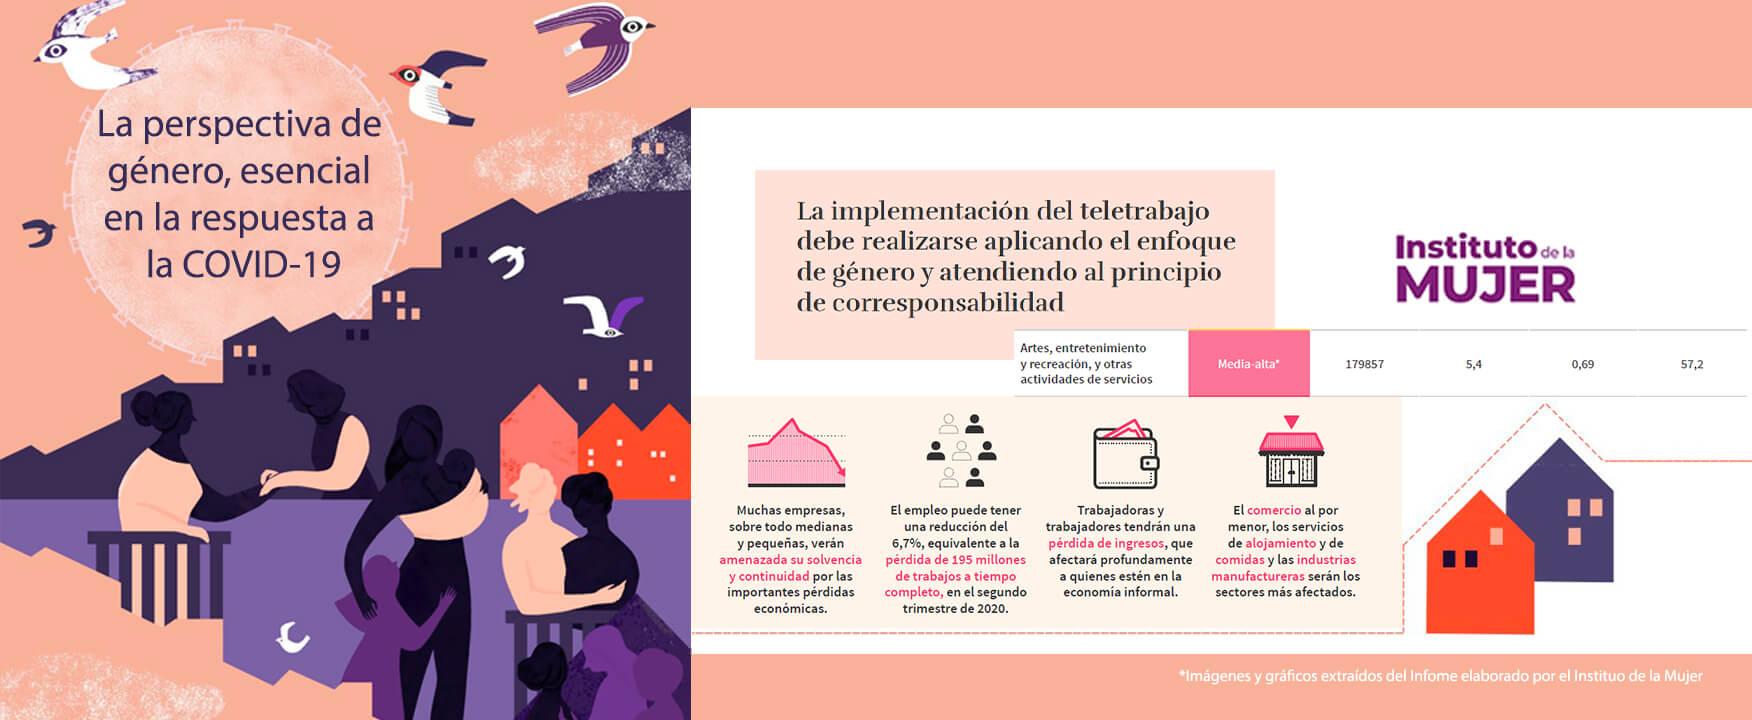 Informe-Instituto-de-la-mujer